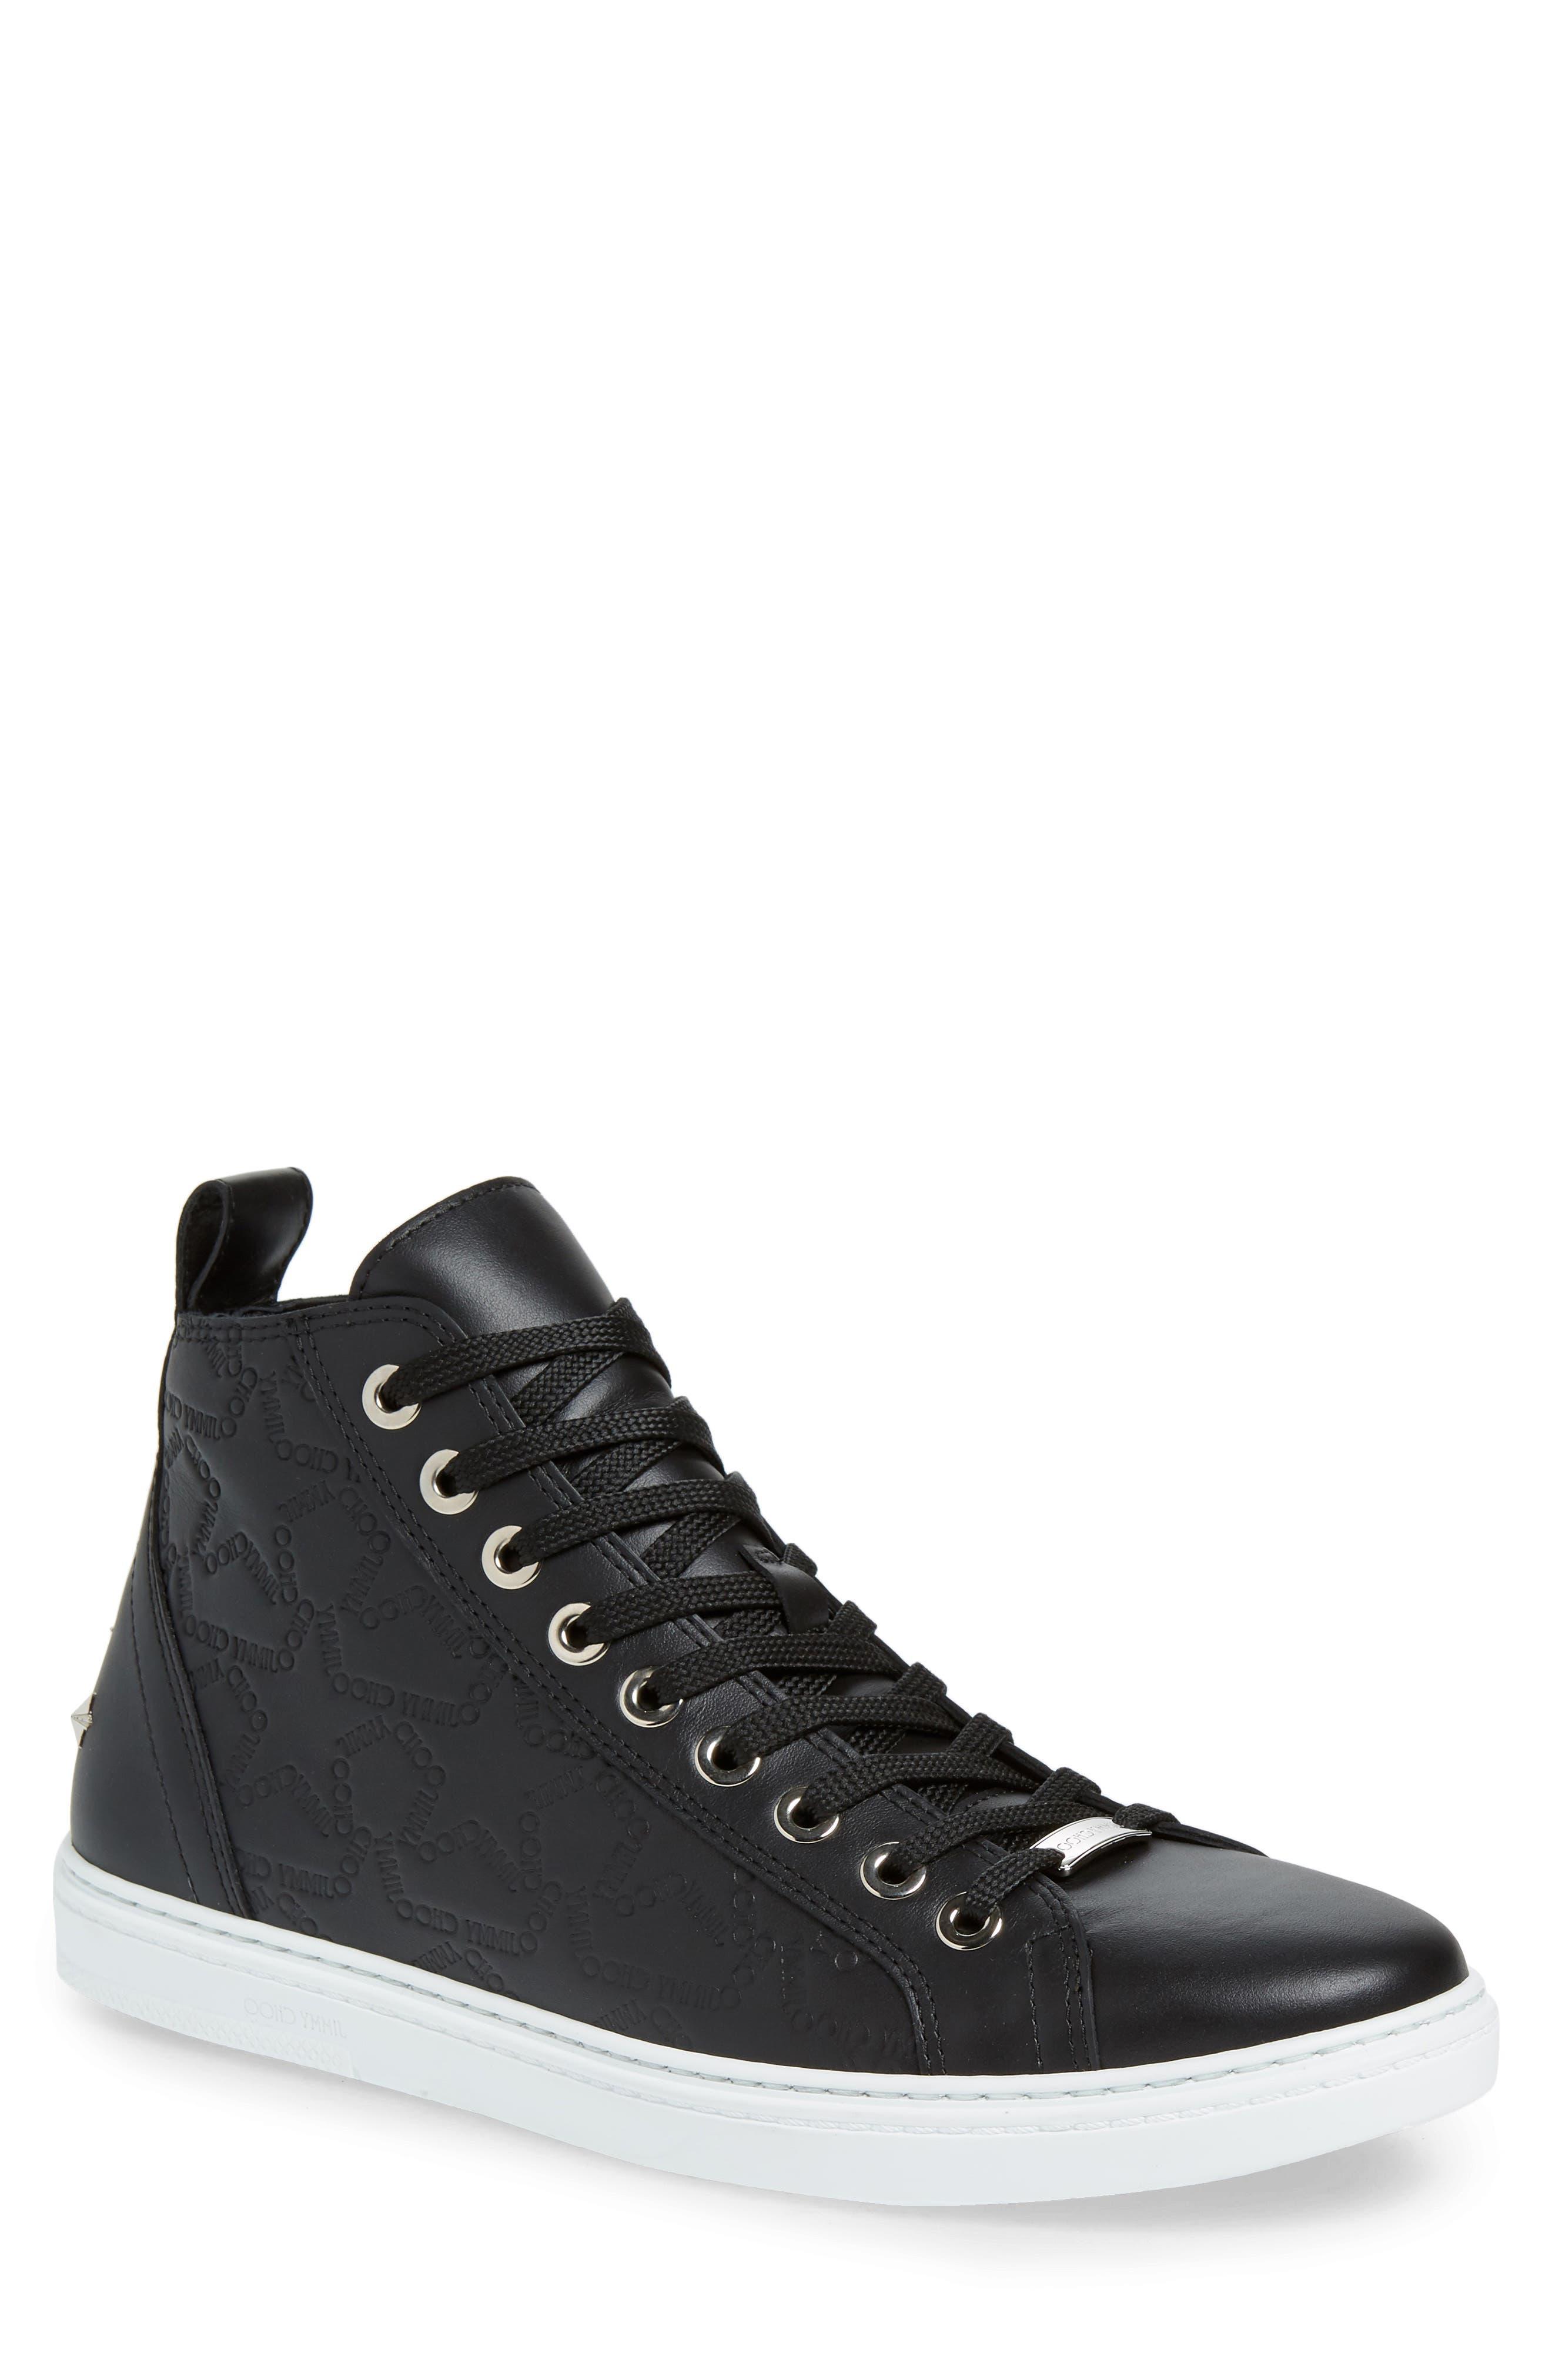 Colt High Top Sneaker,                         Main,                         color, 001